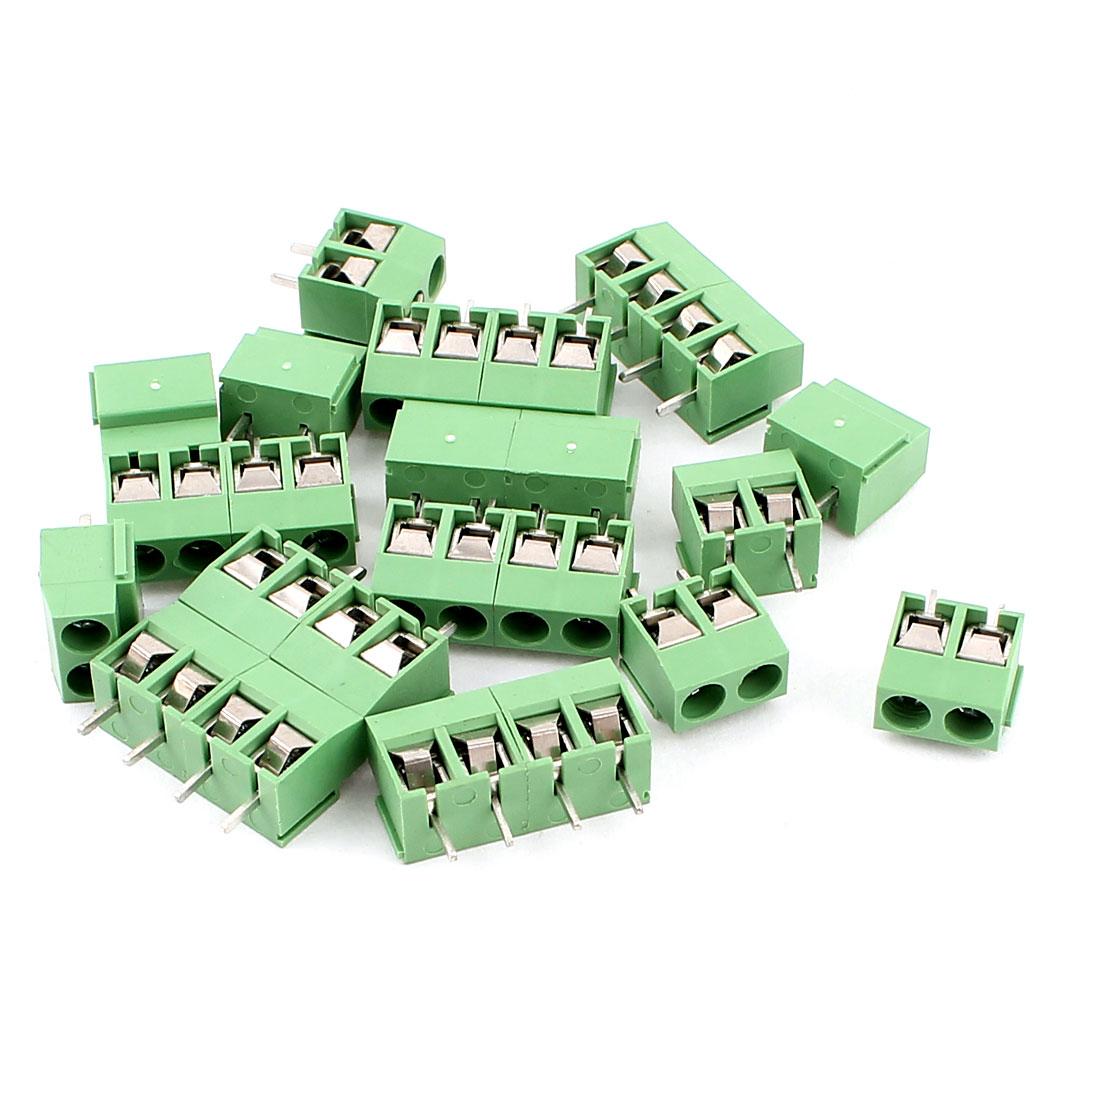 12 Pcs AC 300V 10A 4 Pins PCB Screw Terminal Block Connector 4.5mm Pitch Green